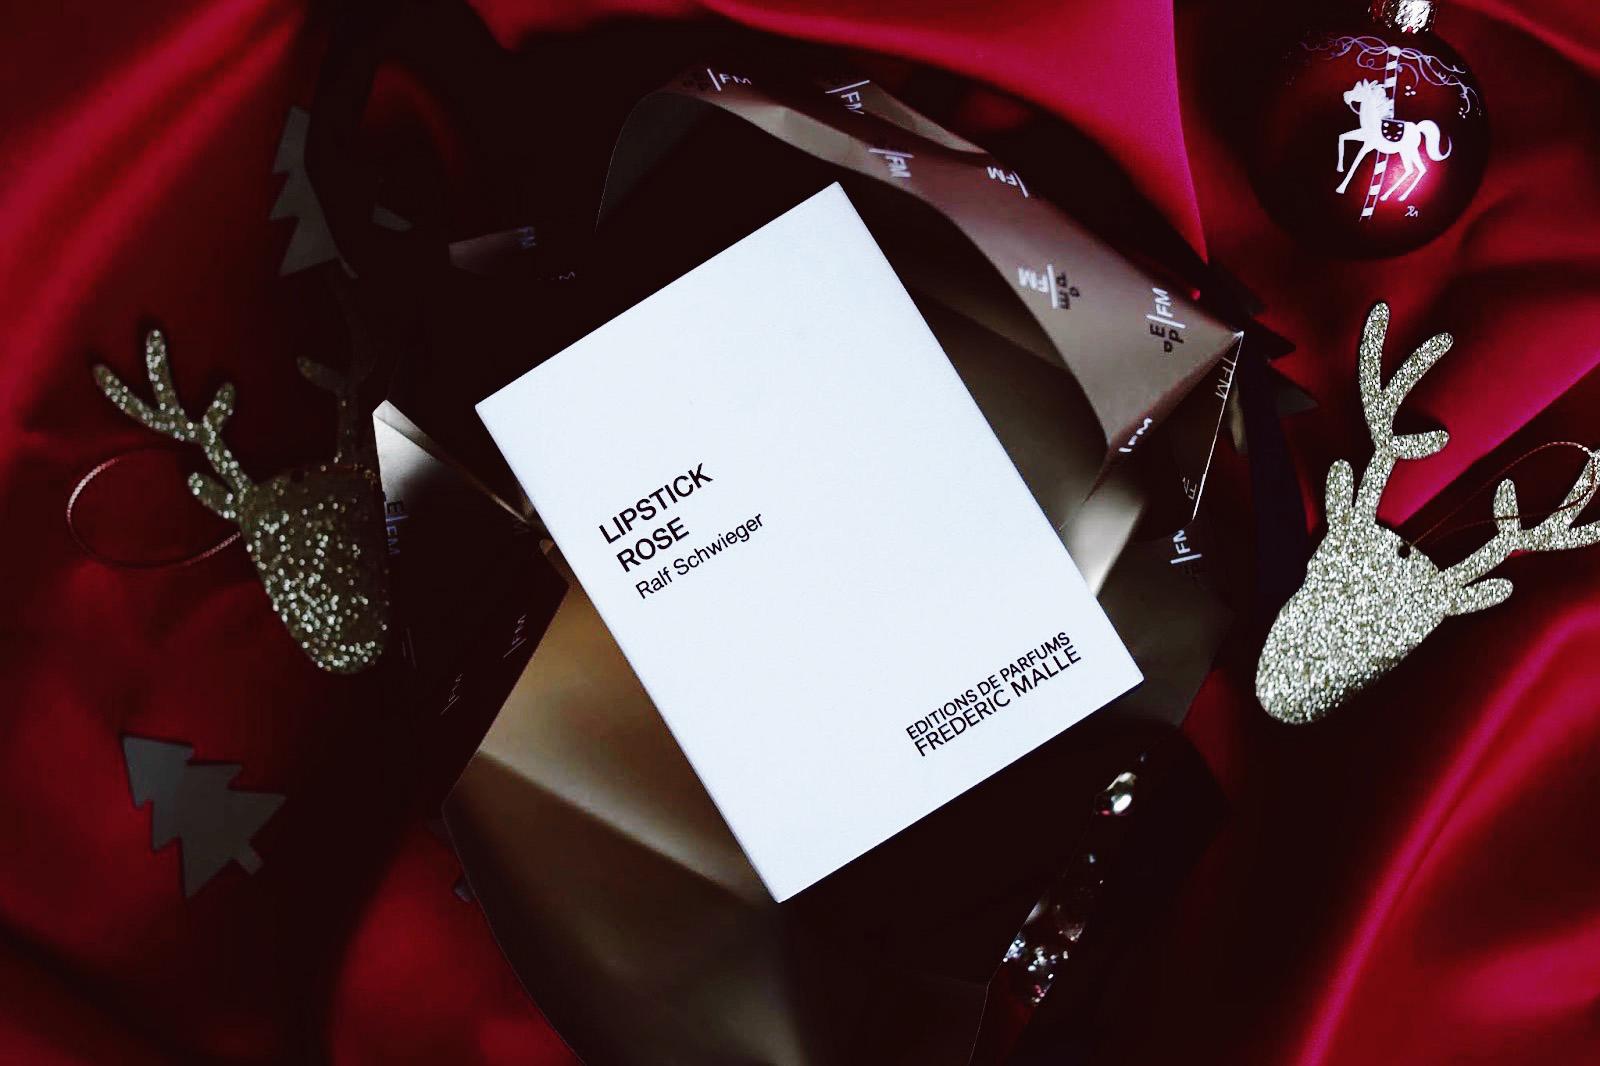 frederic malle lipstick rose parfum avis test edition limitée noel 2018